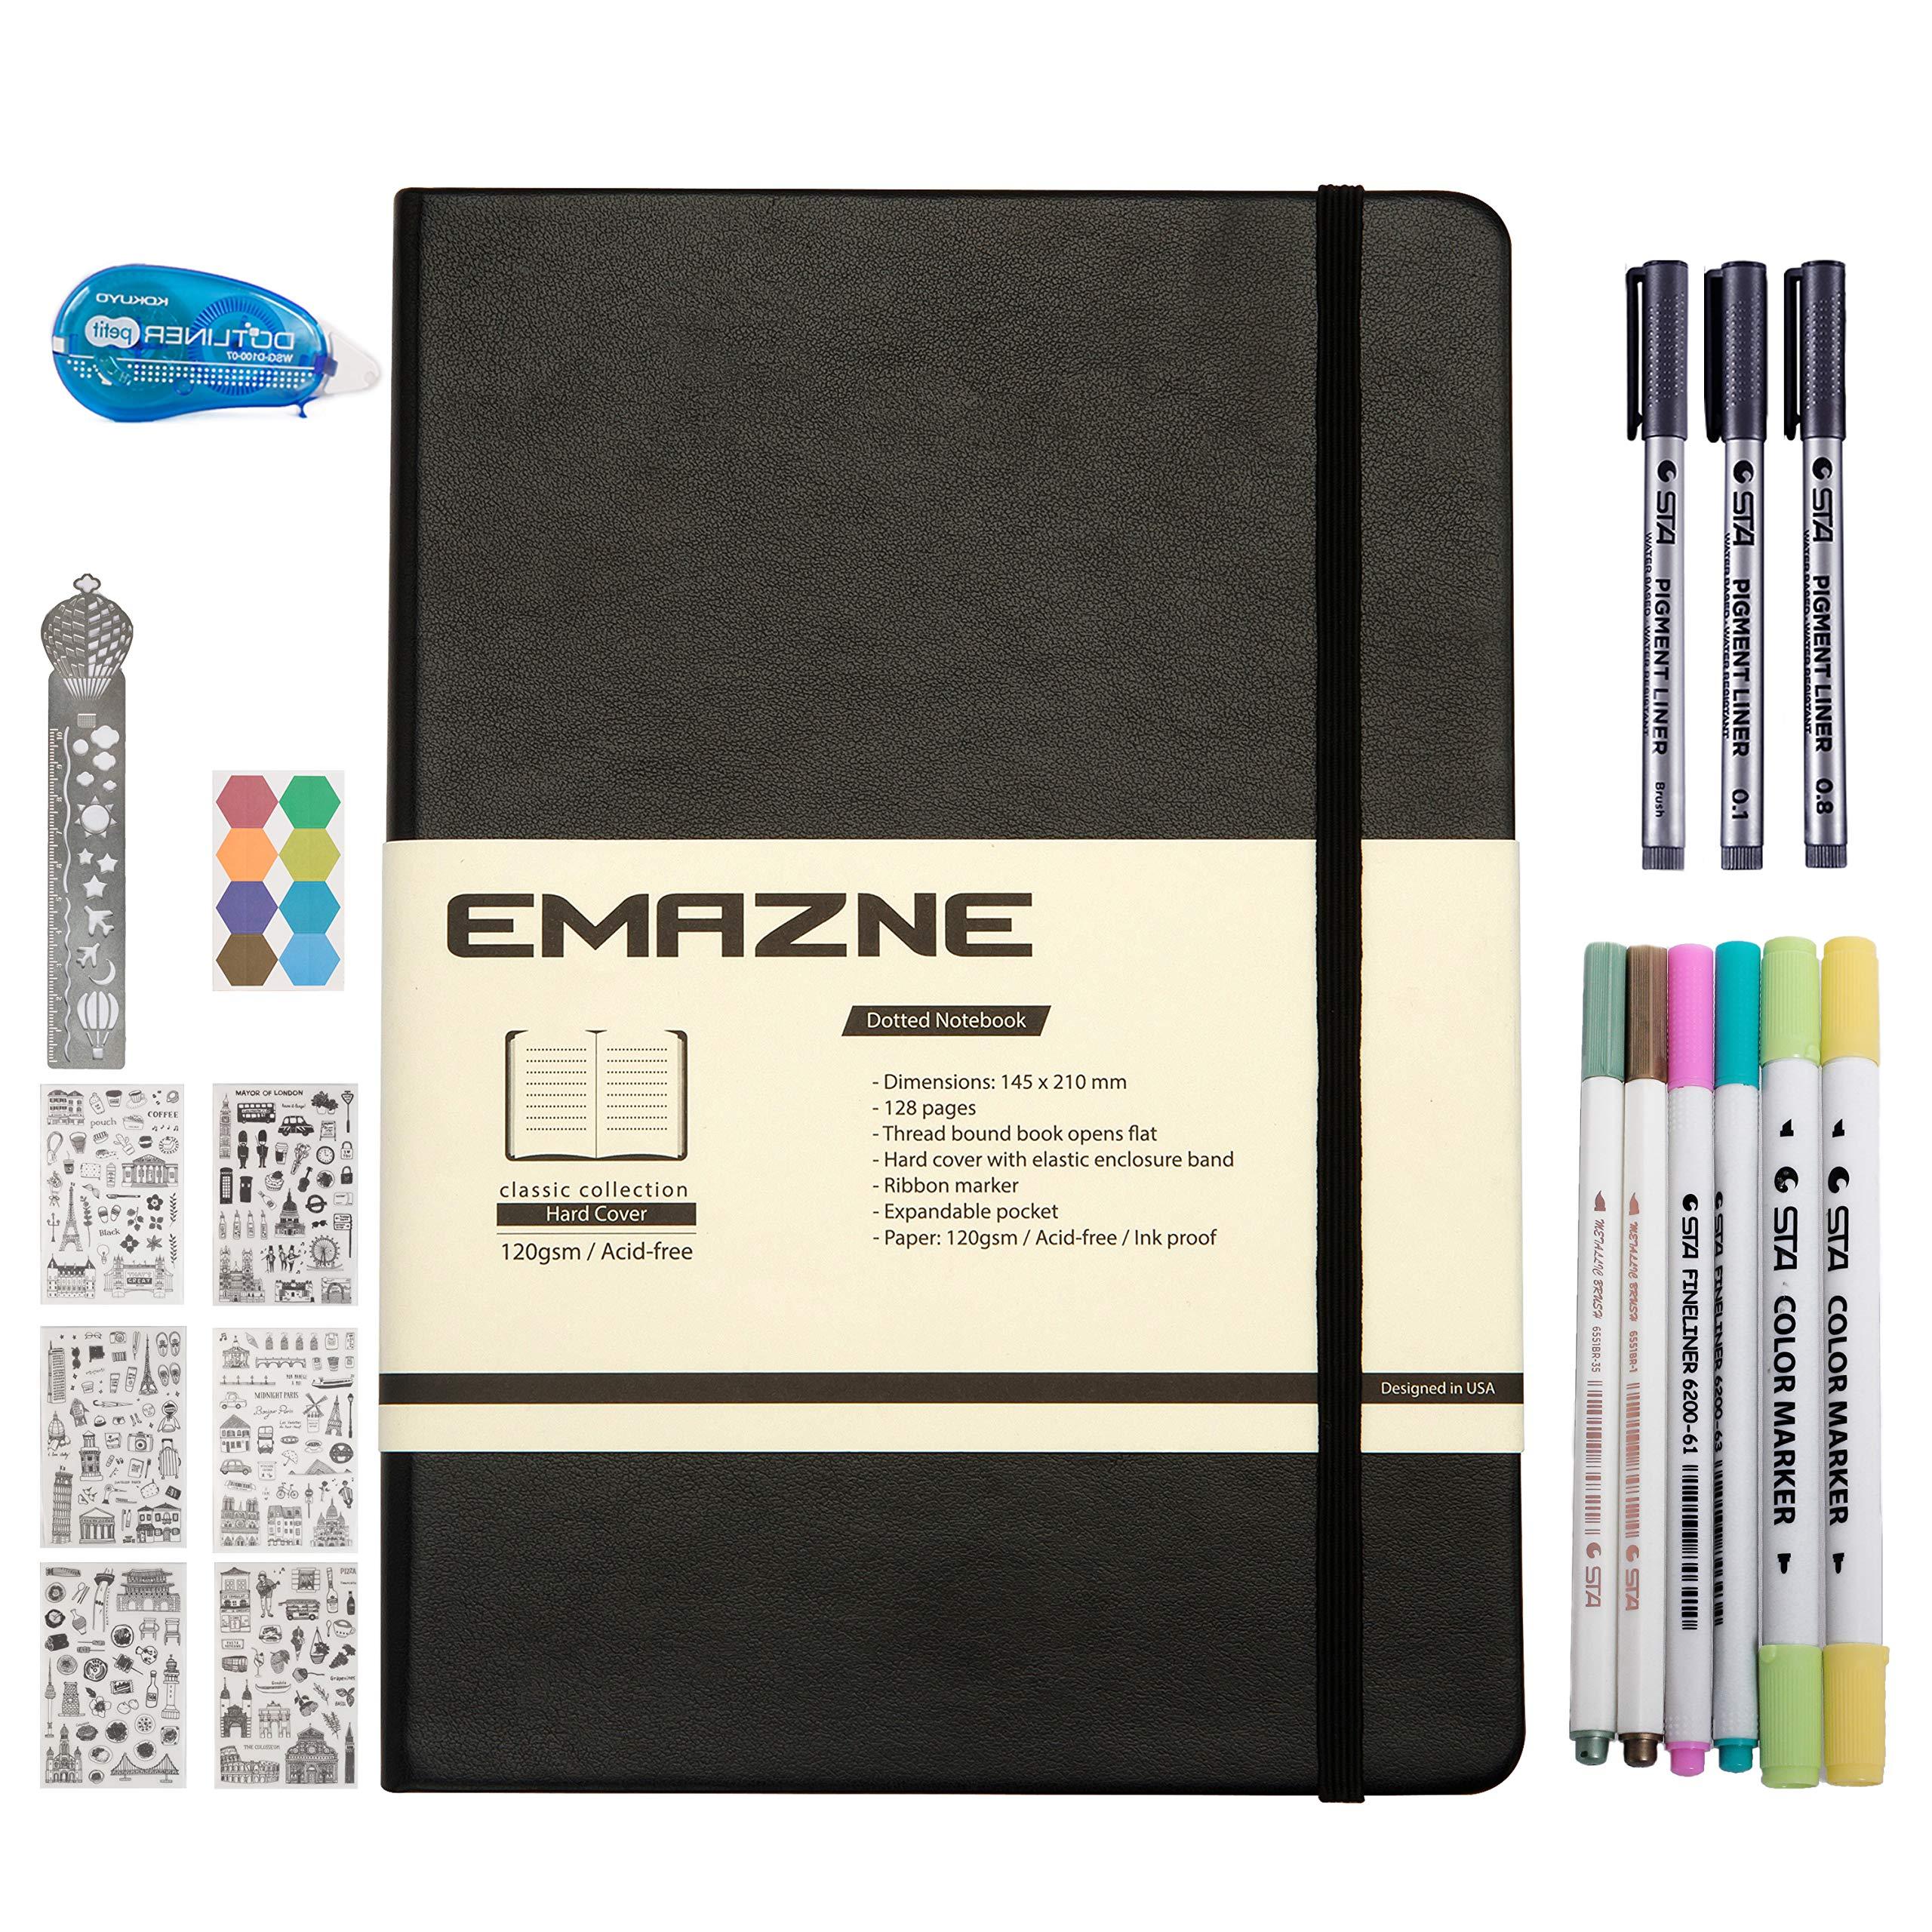 Bullet Journal Kit Emazne Classic Hardcover Notebook,A5,120gsm Paper,Fineliner/Brush-Flexible/Marker Pens,Sticker Sheet,Dotliner Tape Glue,Metal Ruler,Index Tab,Inner Pocket,Designed in US (Black)